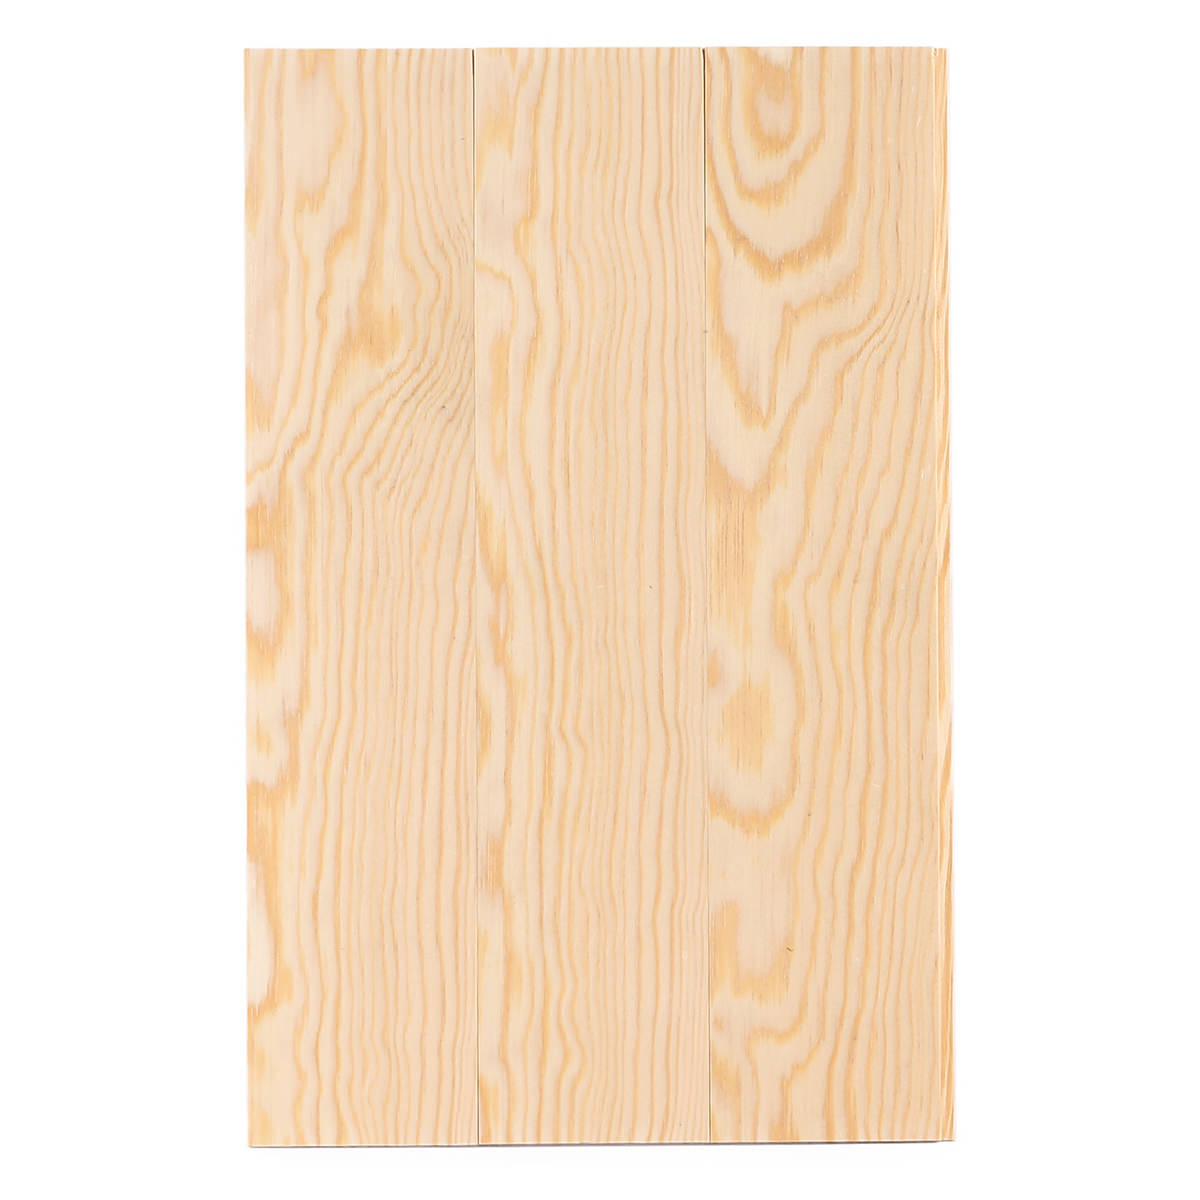 3 4 X 3 1 8 Kiln Dried Yellow Pine Clear Porch Flooring